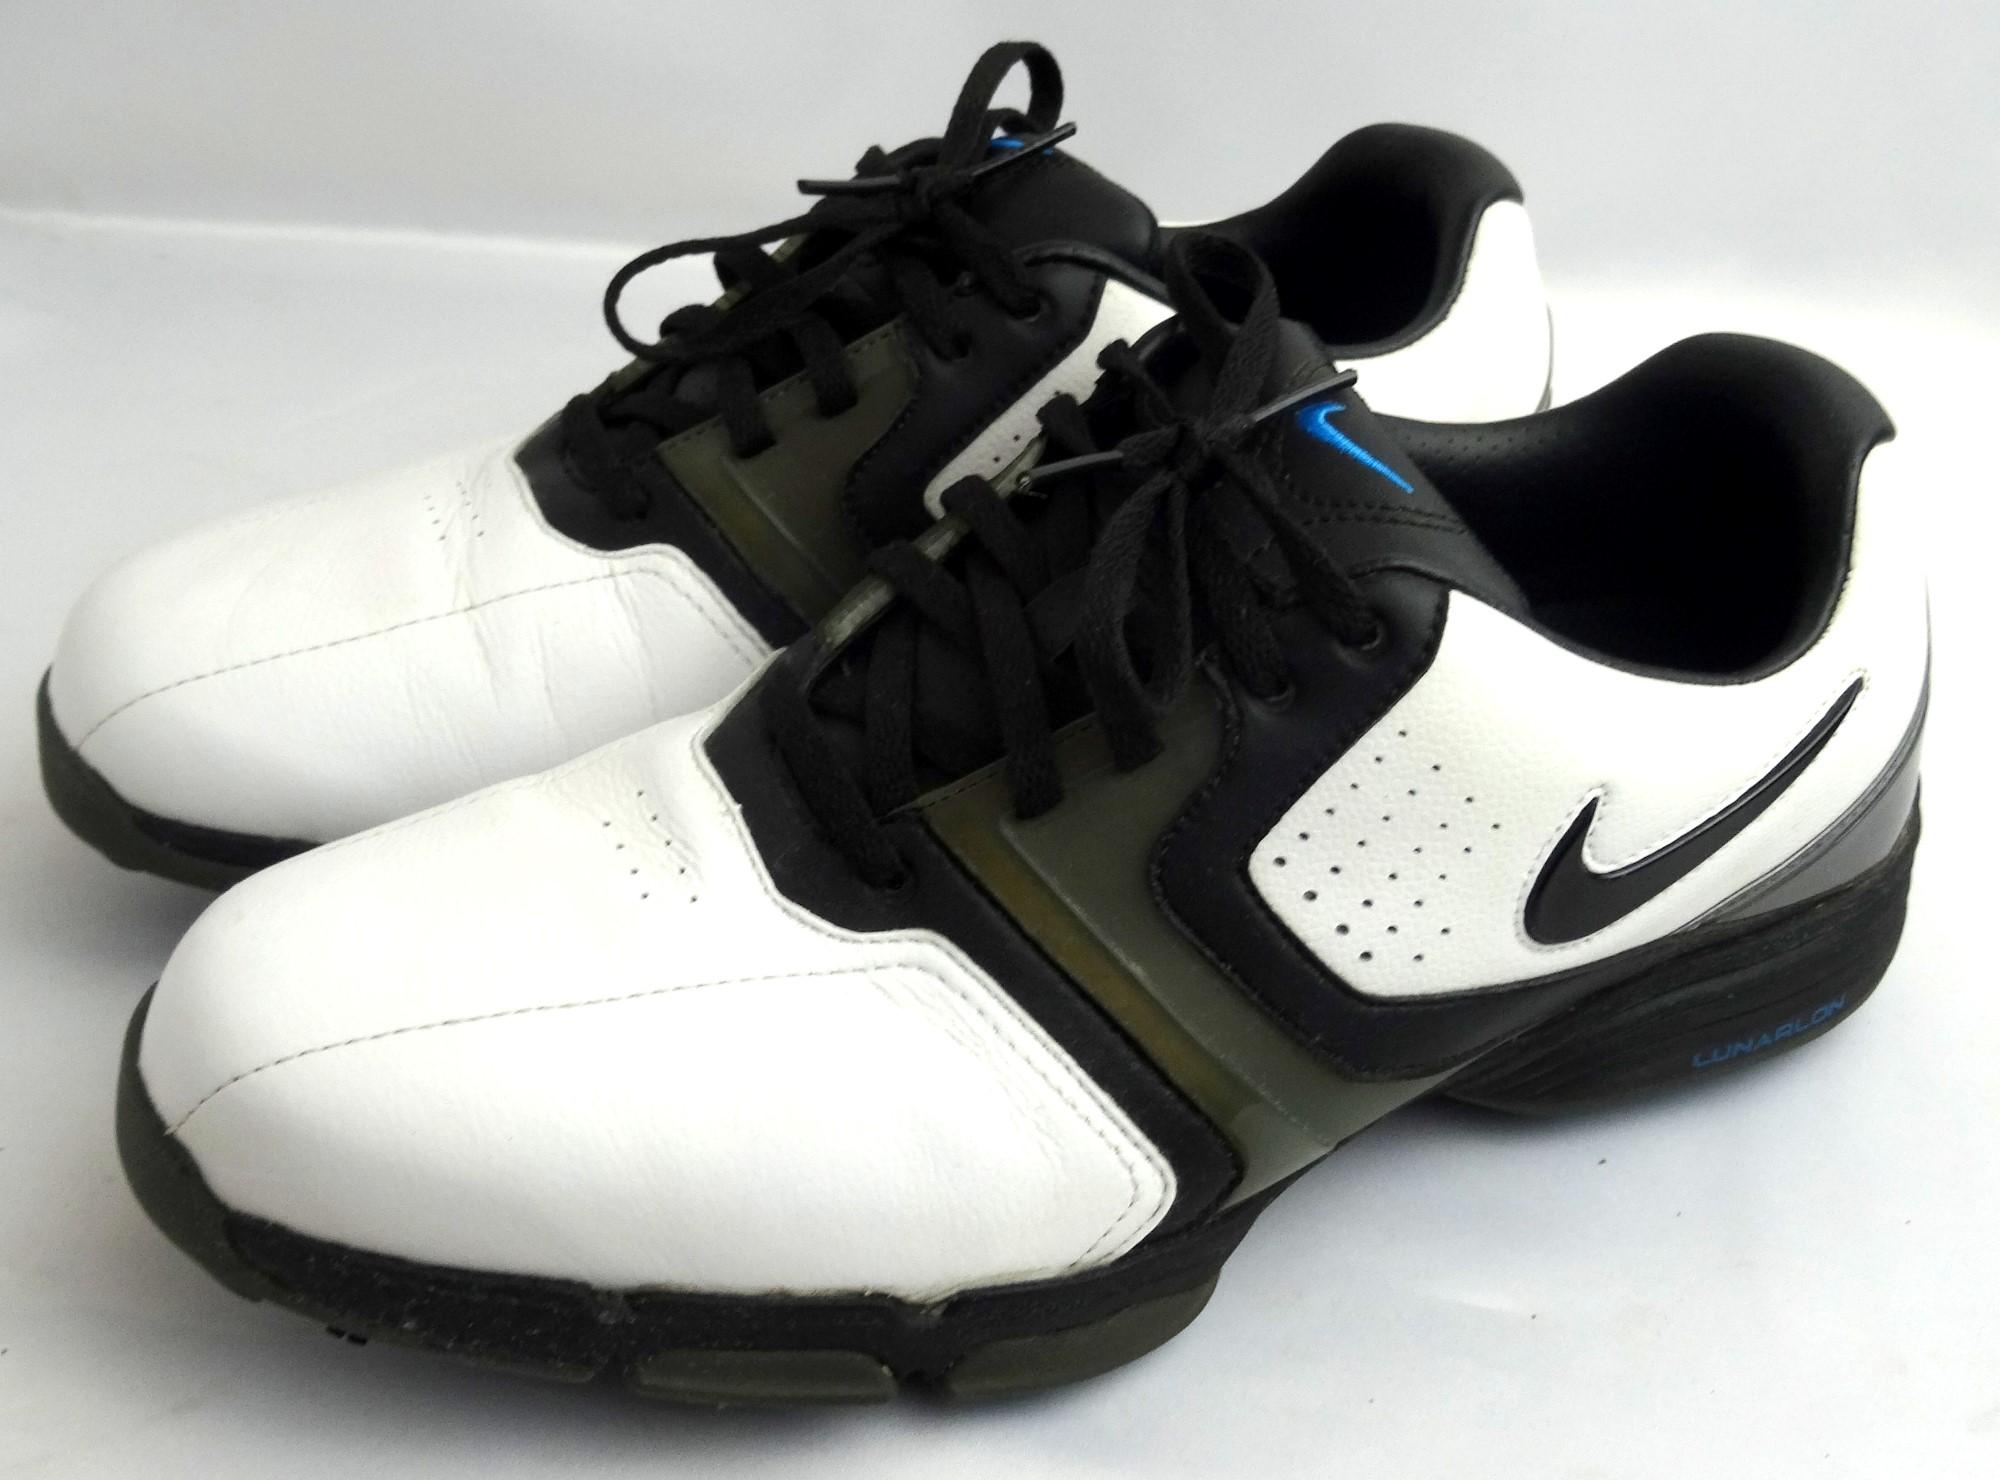 on sale 6a8b9 b5d34 Nike Lunar Saddle Golf Shoes WHITE